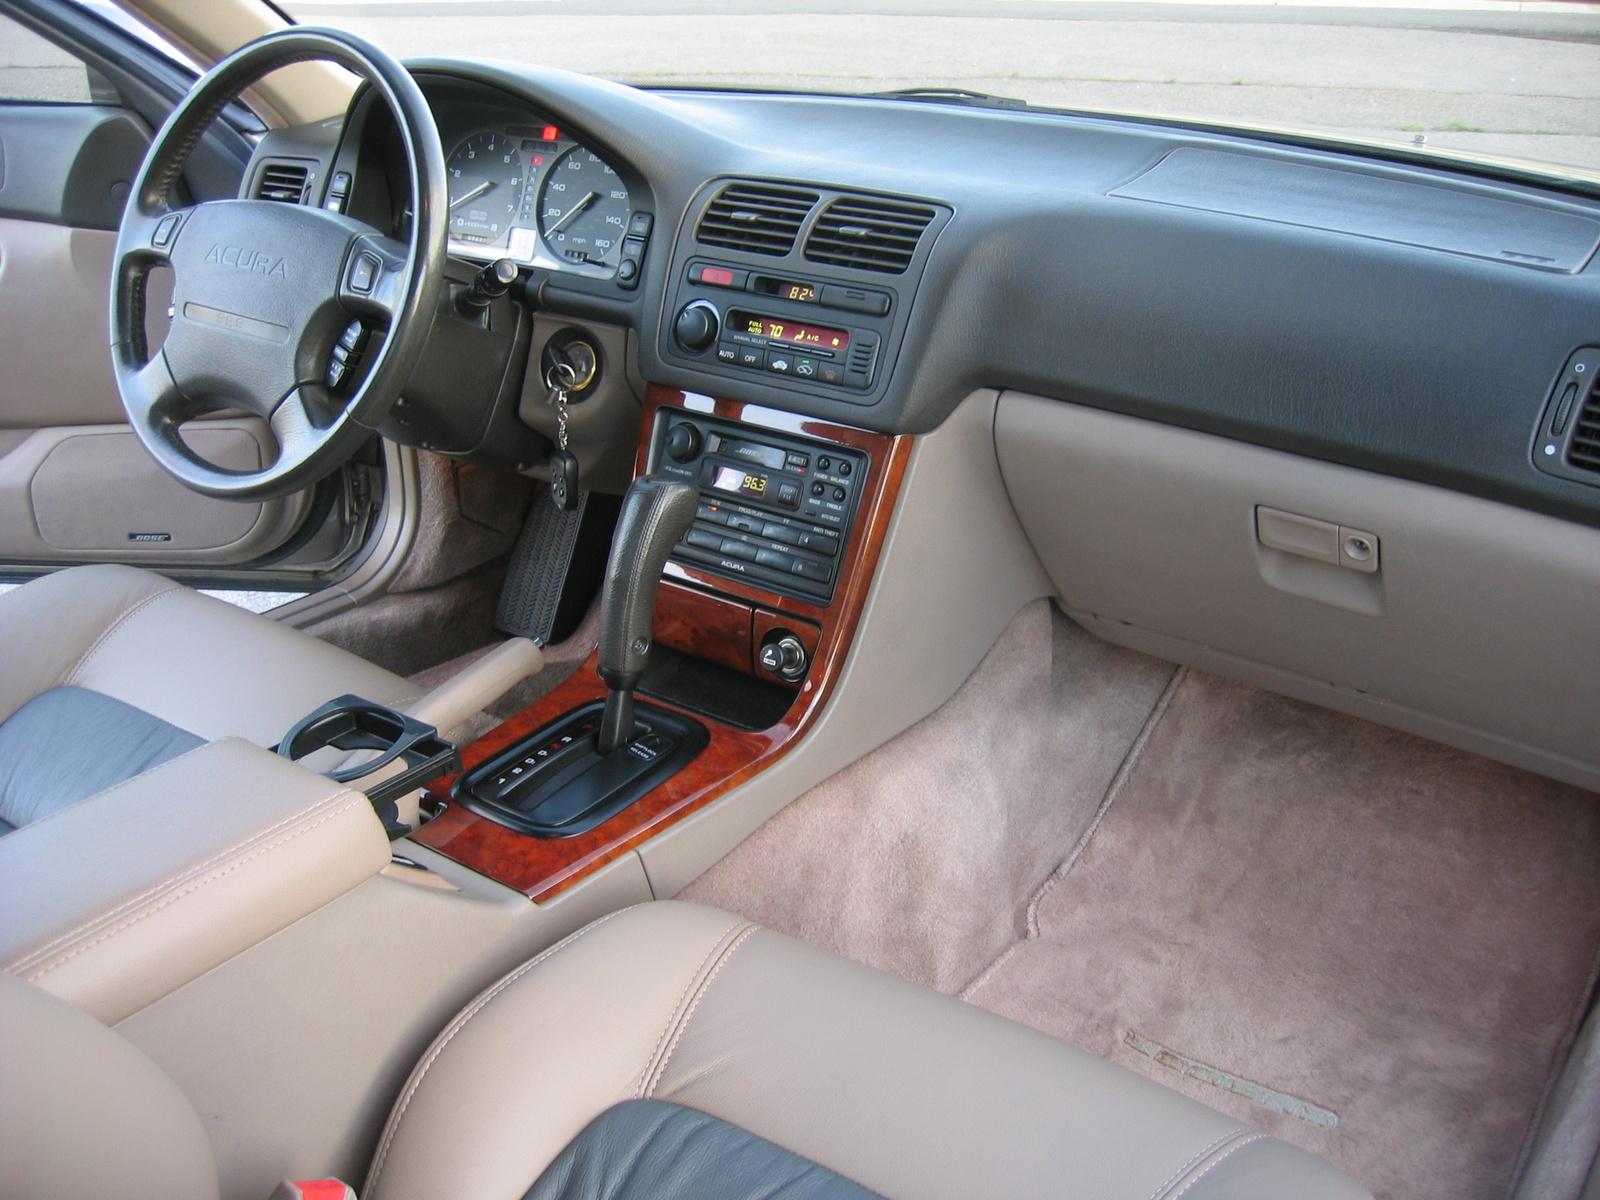 Acura Legend Dr Ls Coupe Pic on 1994 Acura Integra Interior